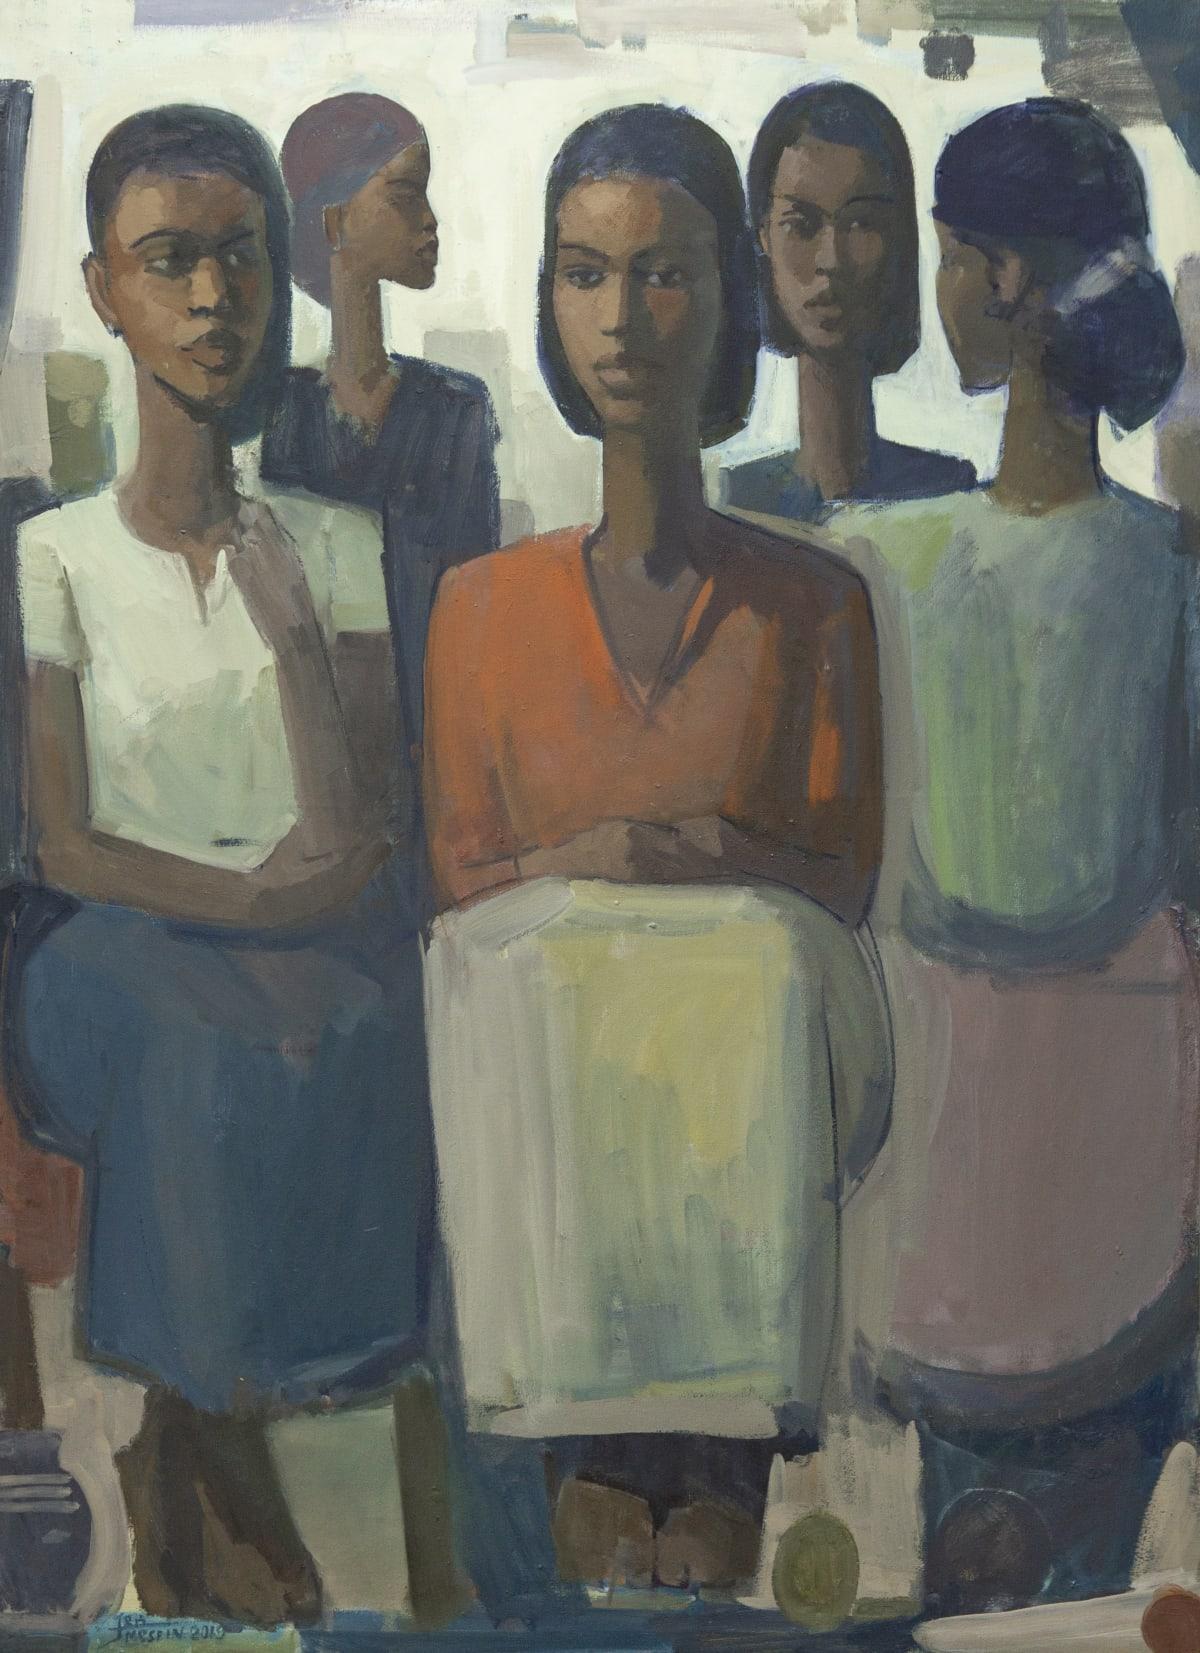 Addis Fine Art Returns to 1-54 Contemporary African Art Fair London